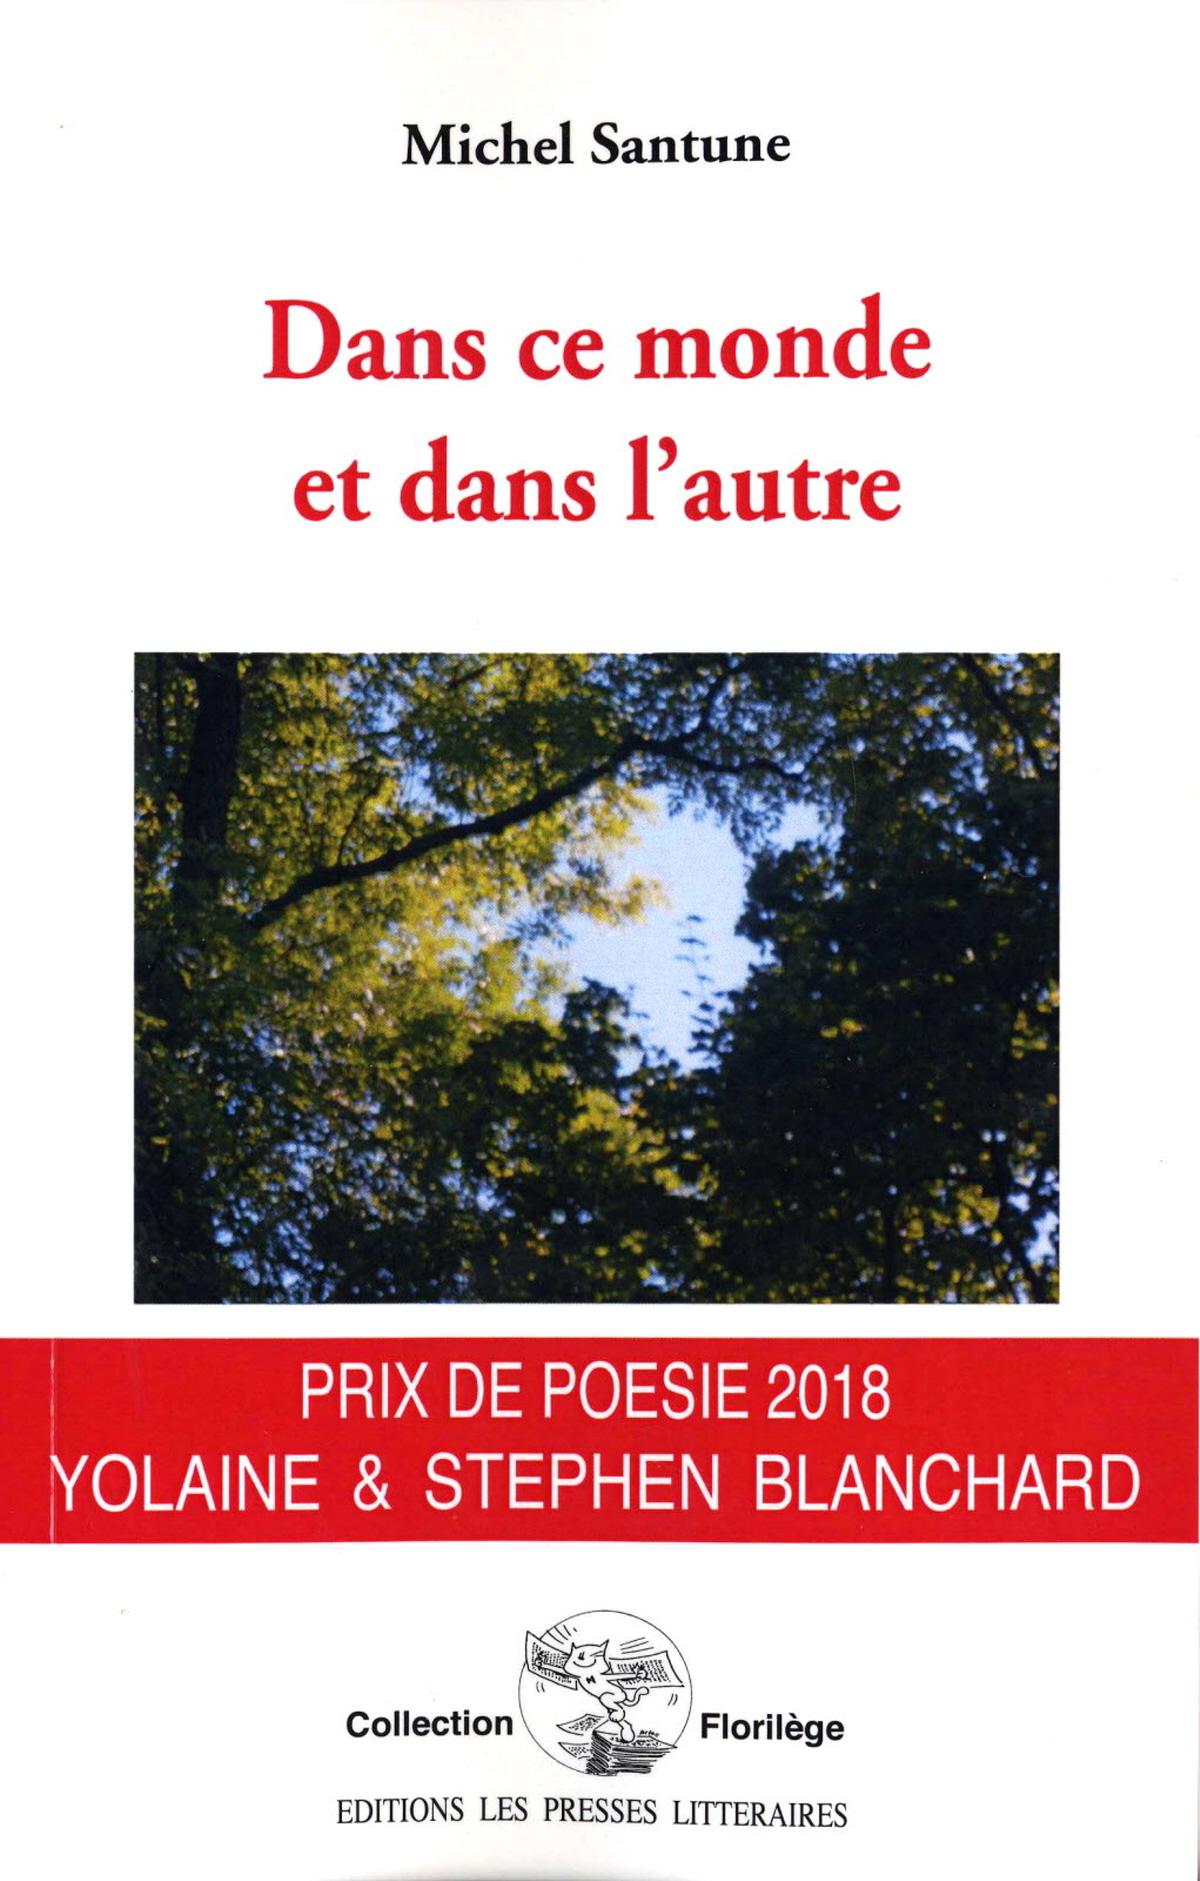 illustration-remise-du-prix-yolaine-et-stephen-blanchard_1-1544455953.jpg